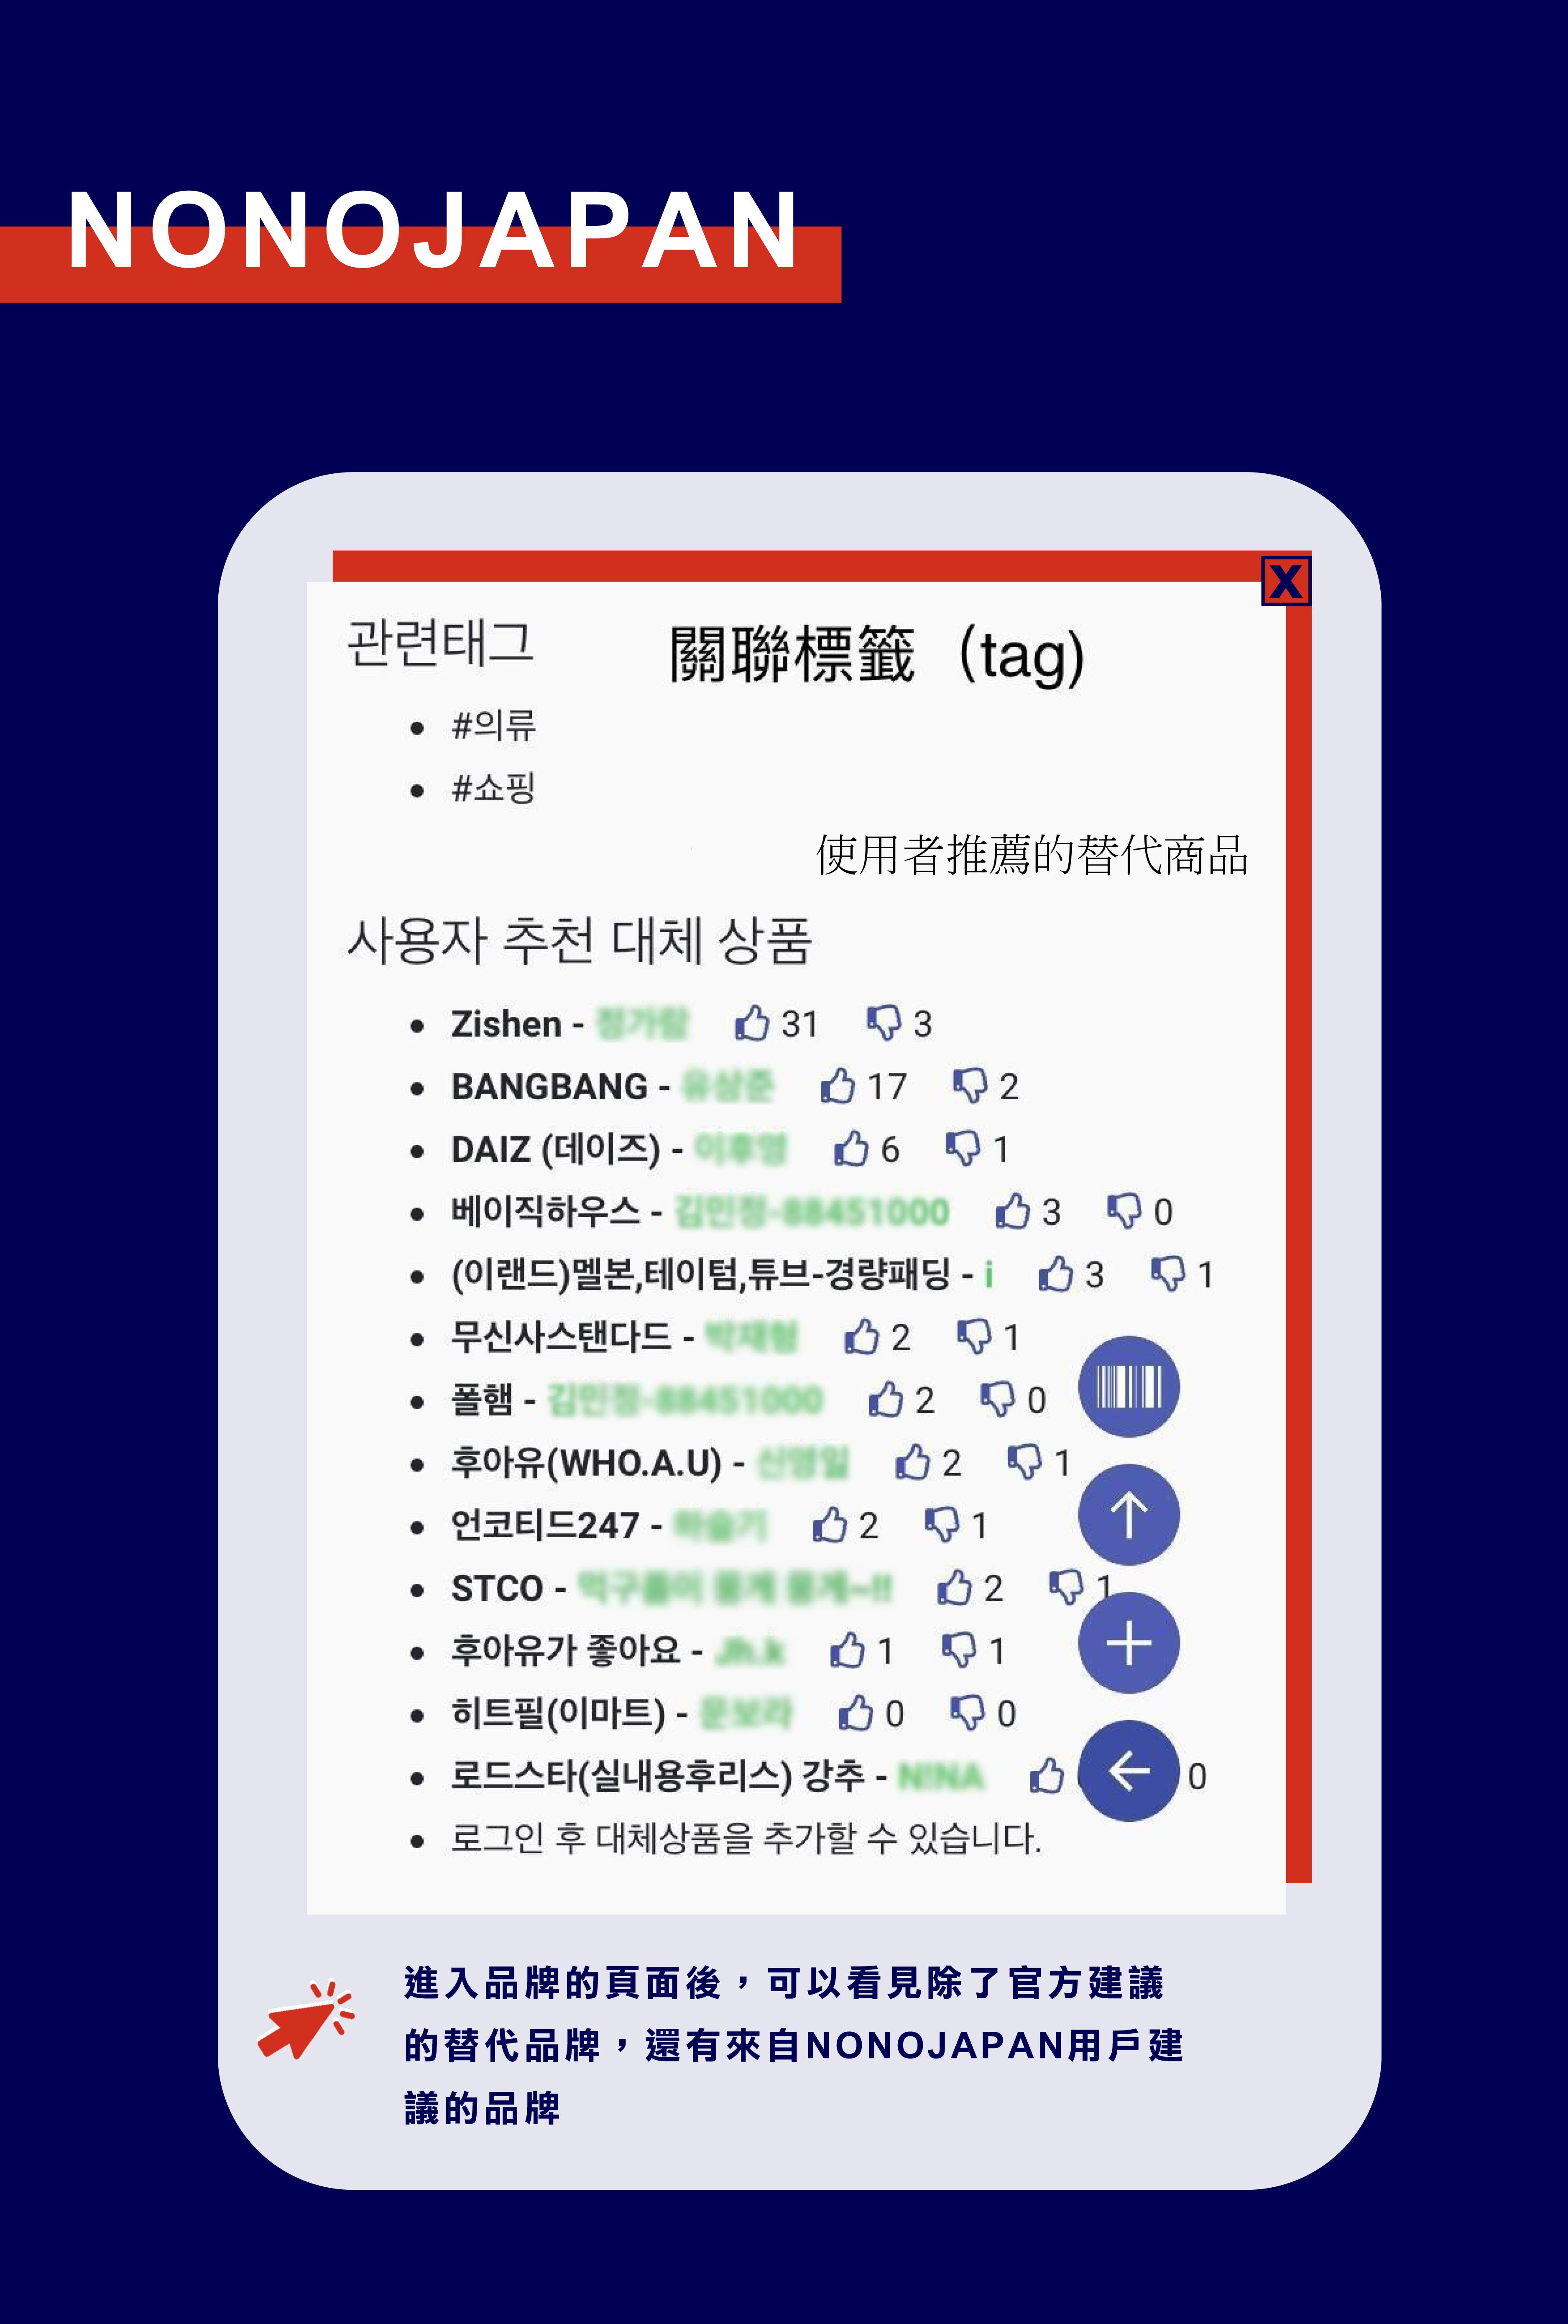 http://ubeat.com.cuhk.edu.hk/wp-content/uploads/2018/box3.jpg